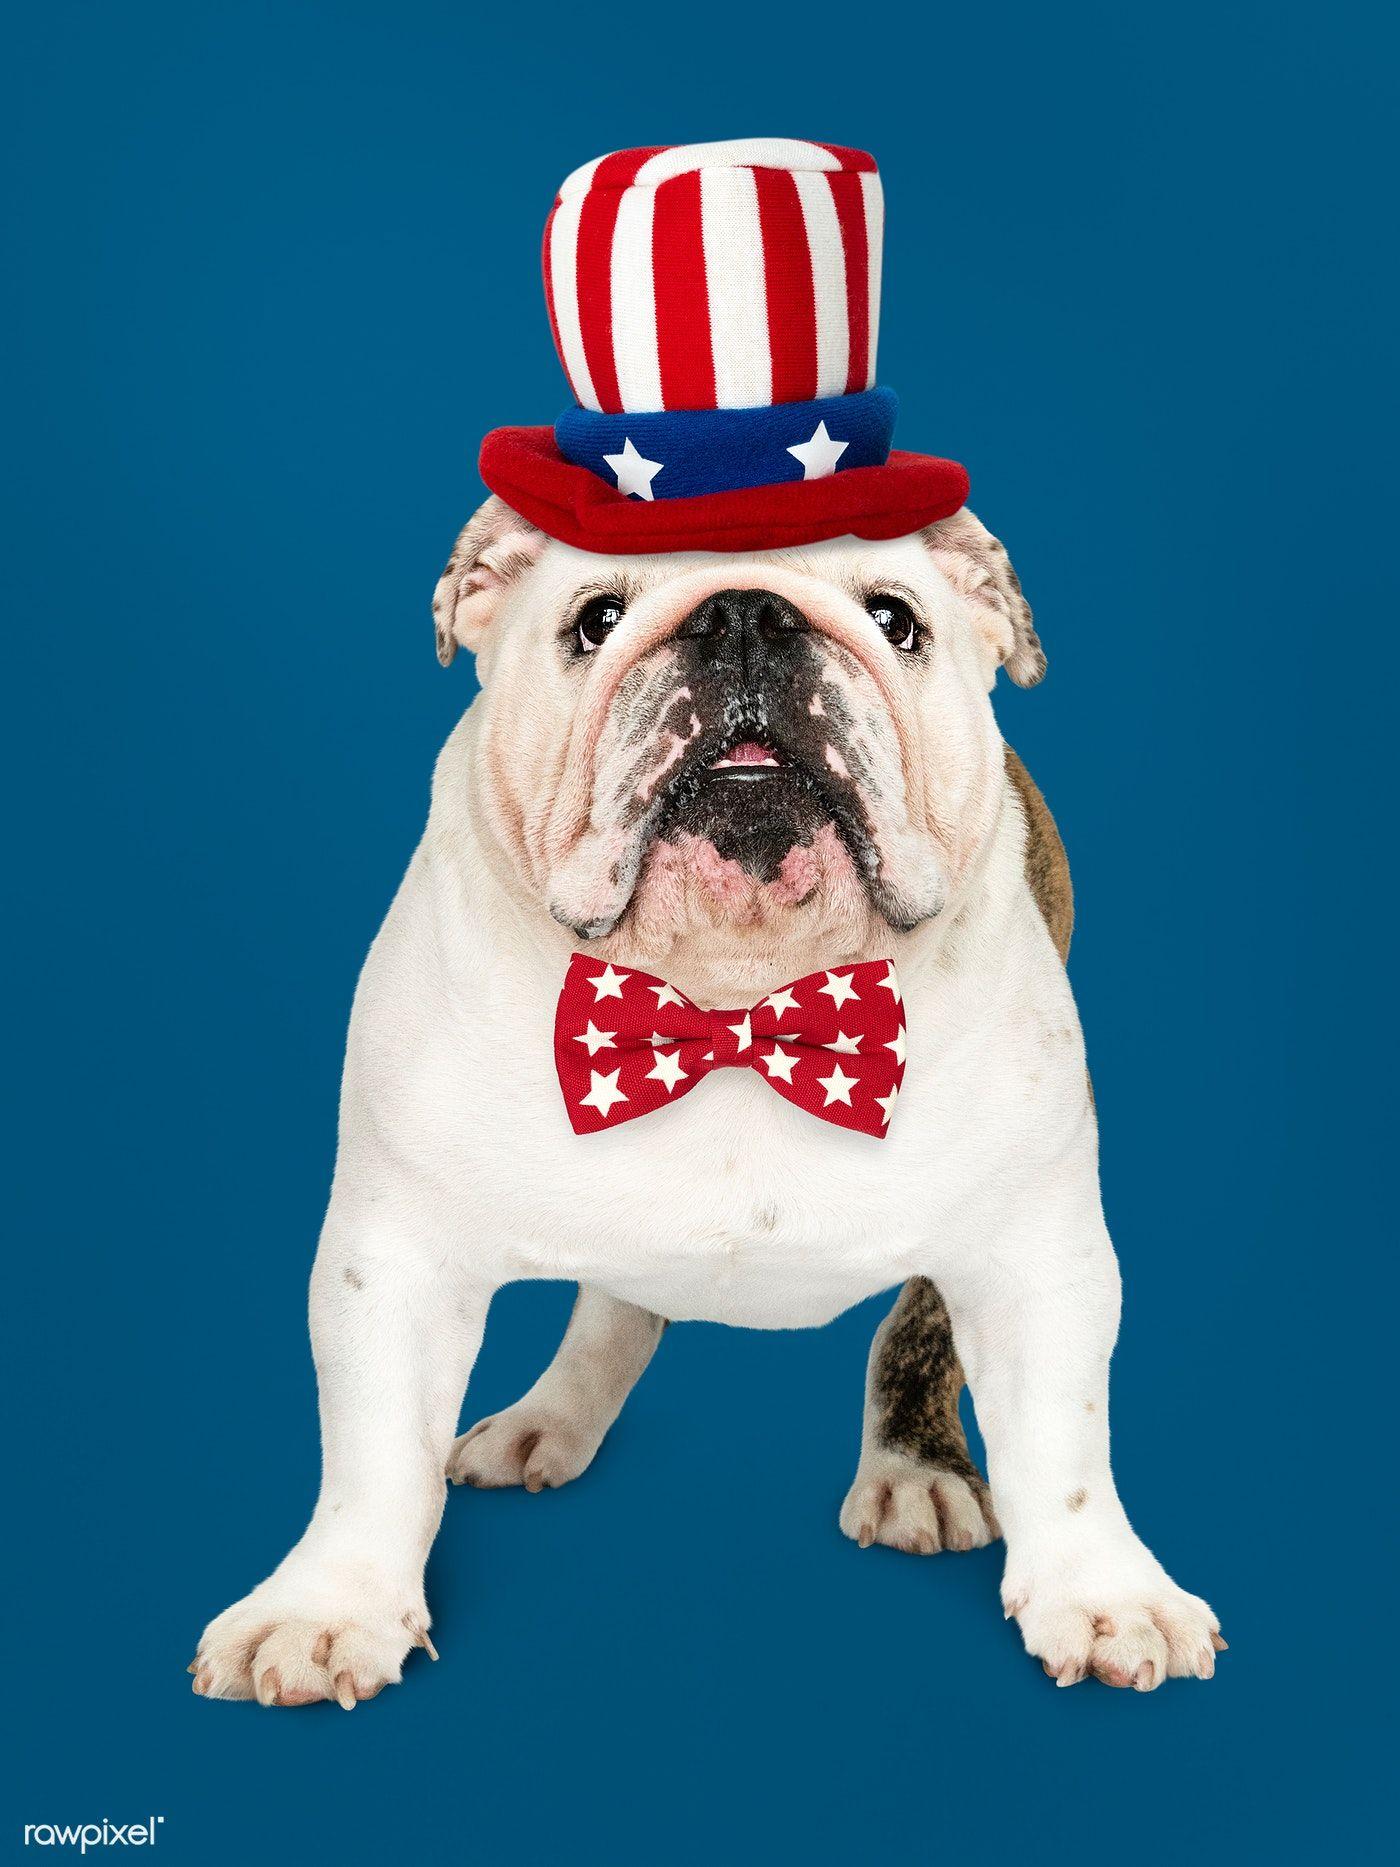 Download Premium Photo Of Cute White English Bulldog Puppy In